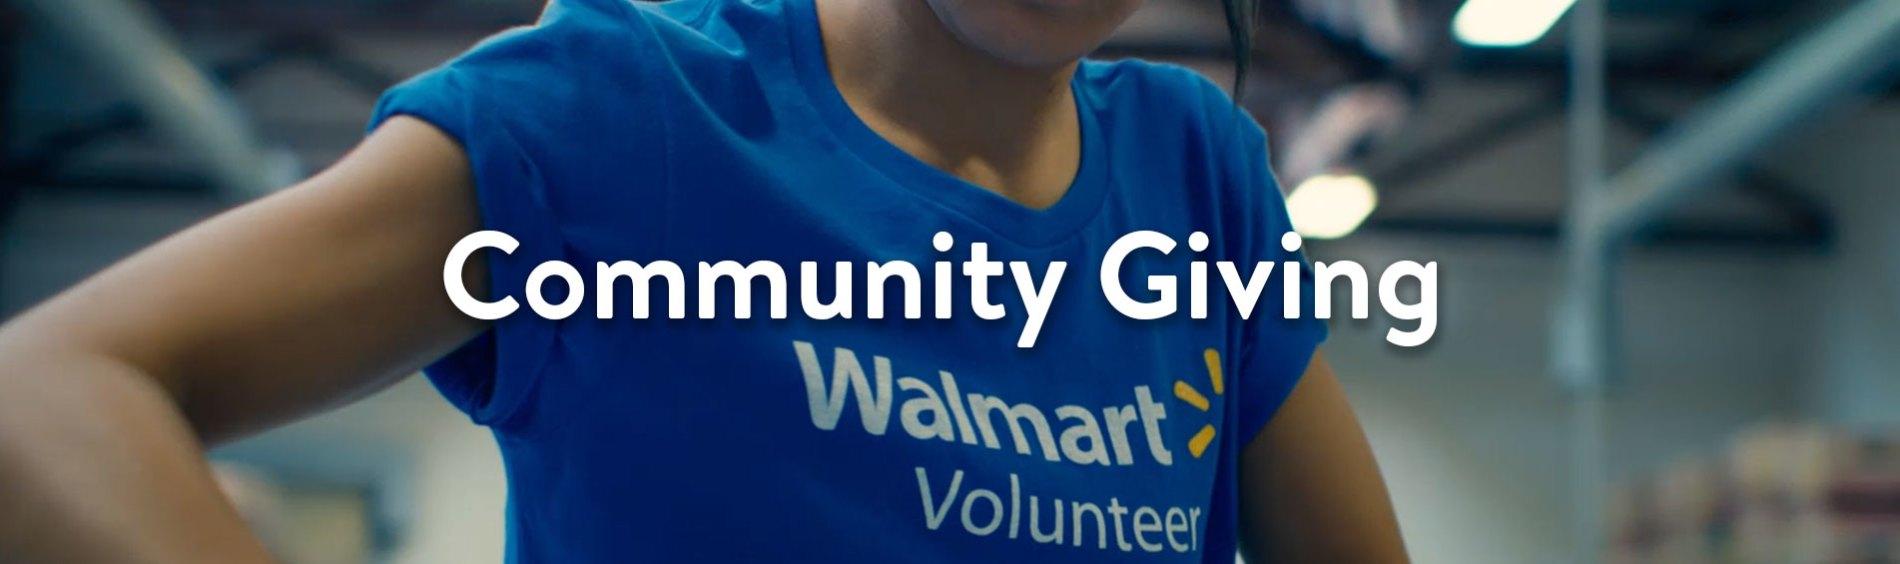 Community Giving